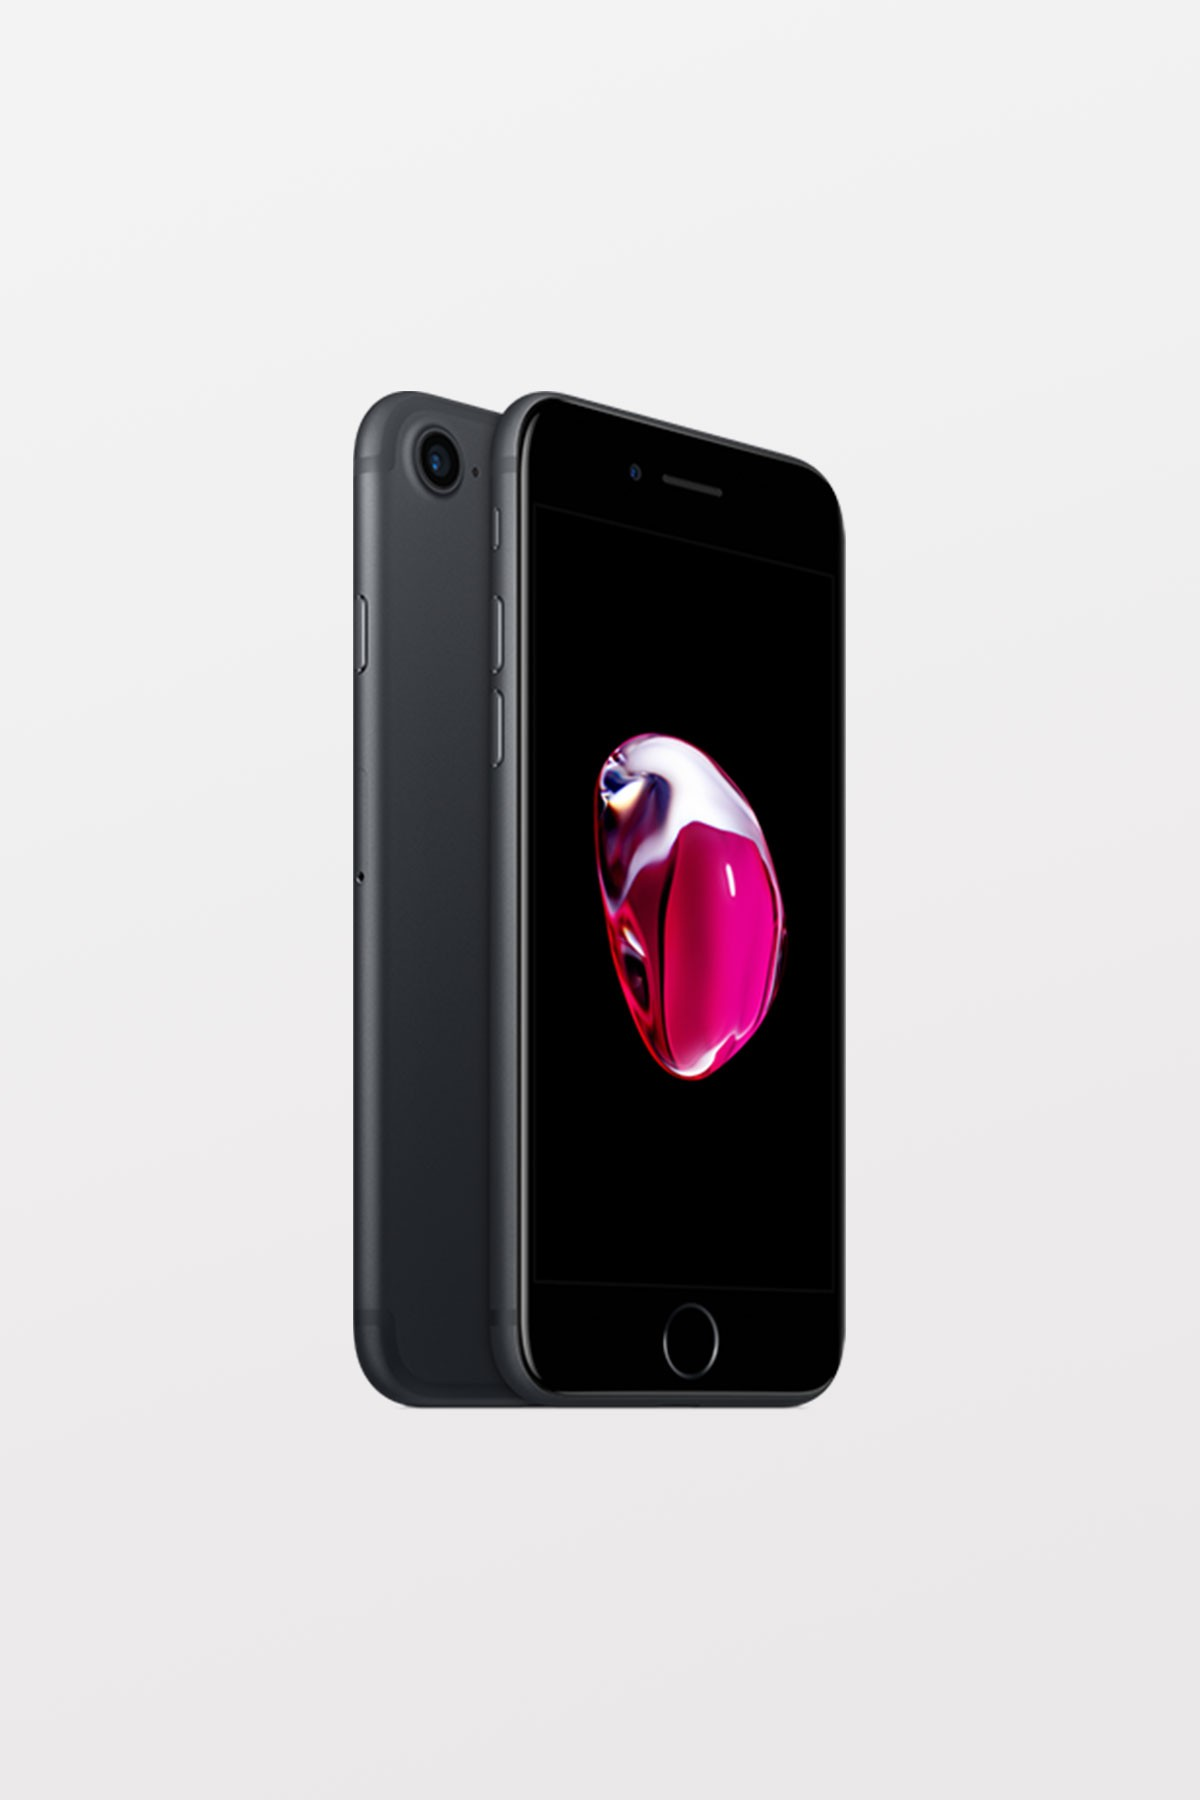 Apple iPhone 7 128GB - Black - Refurbished